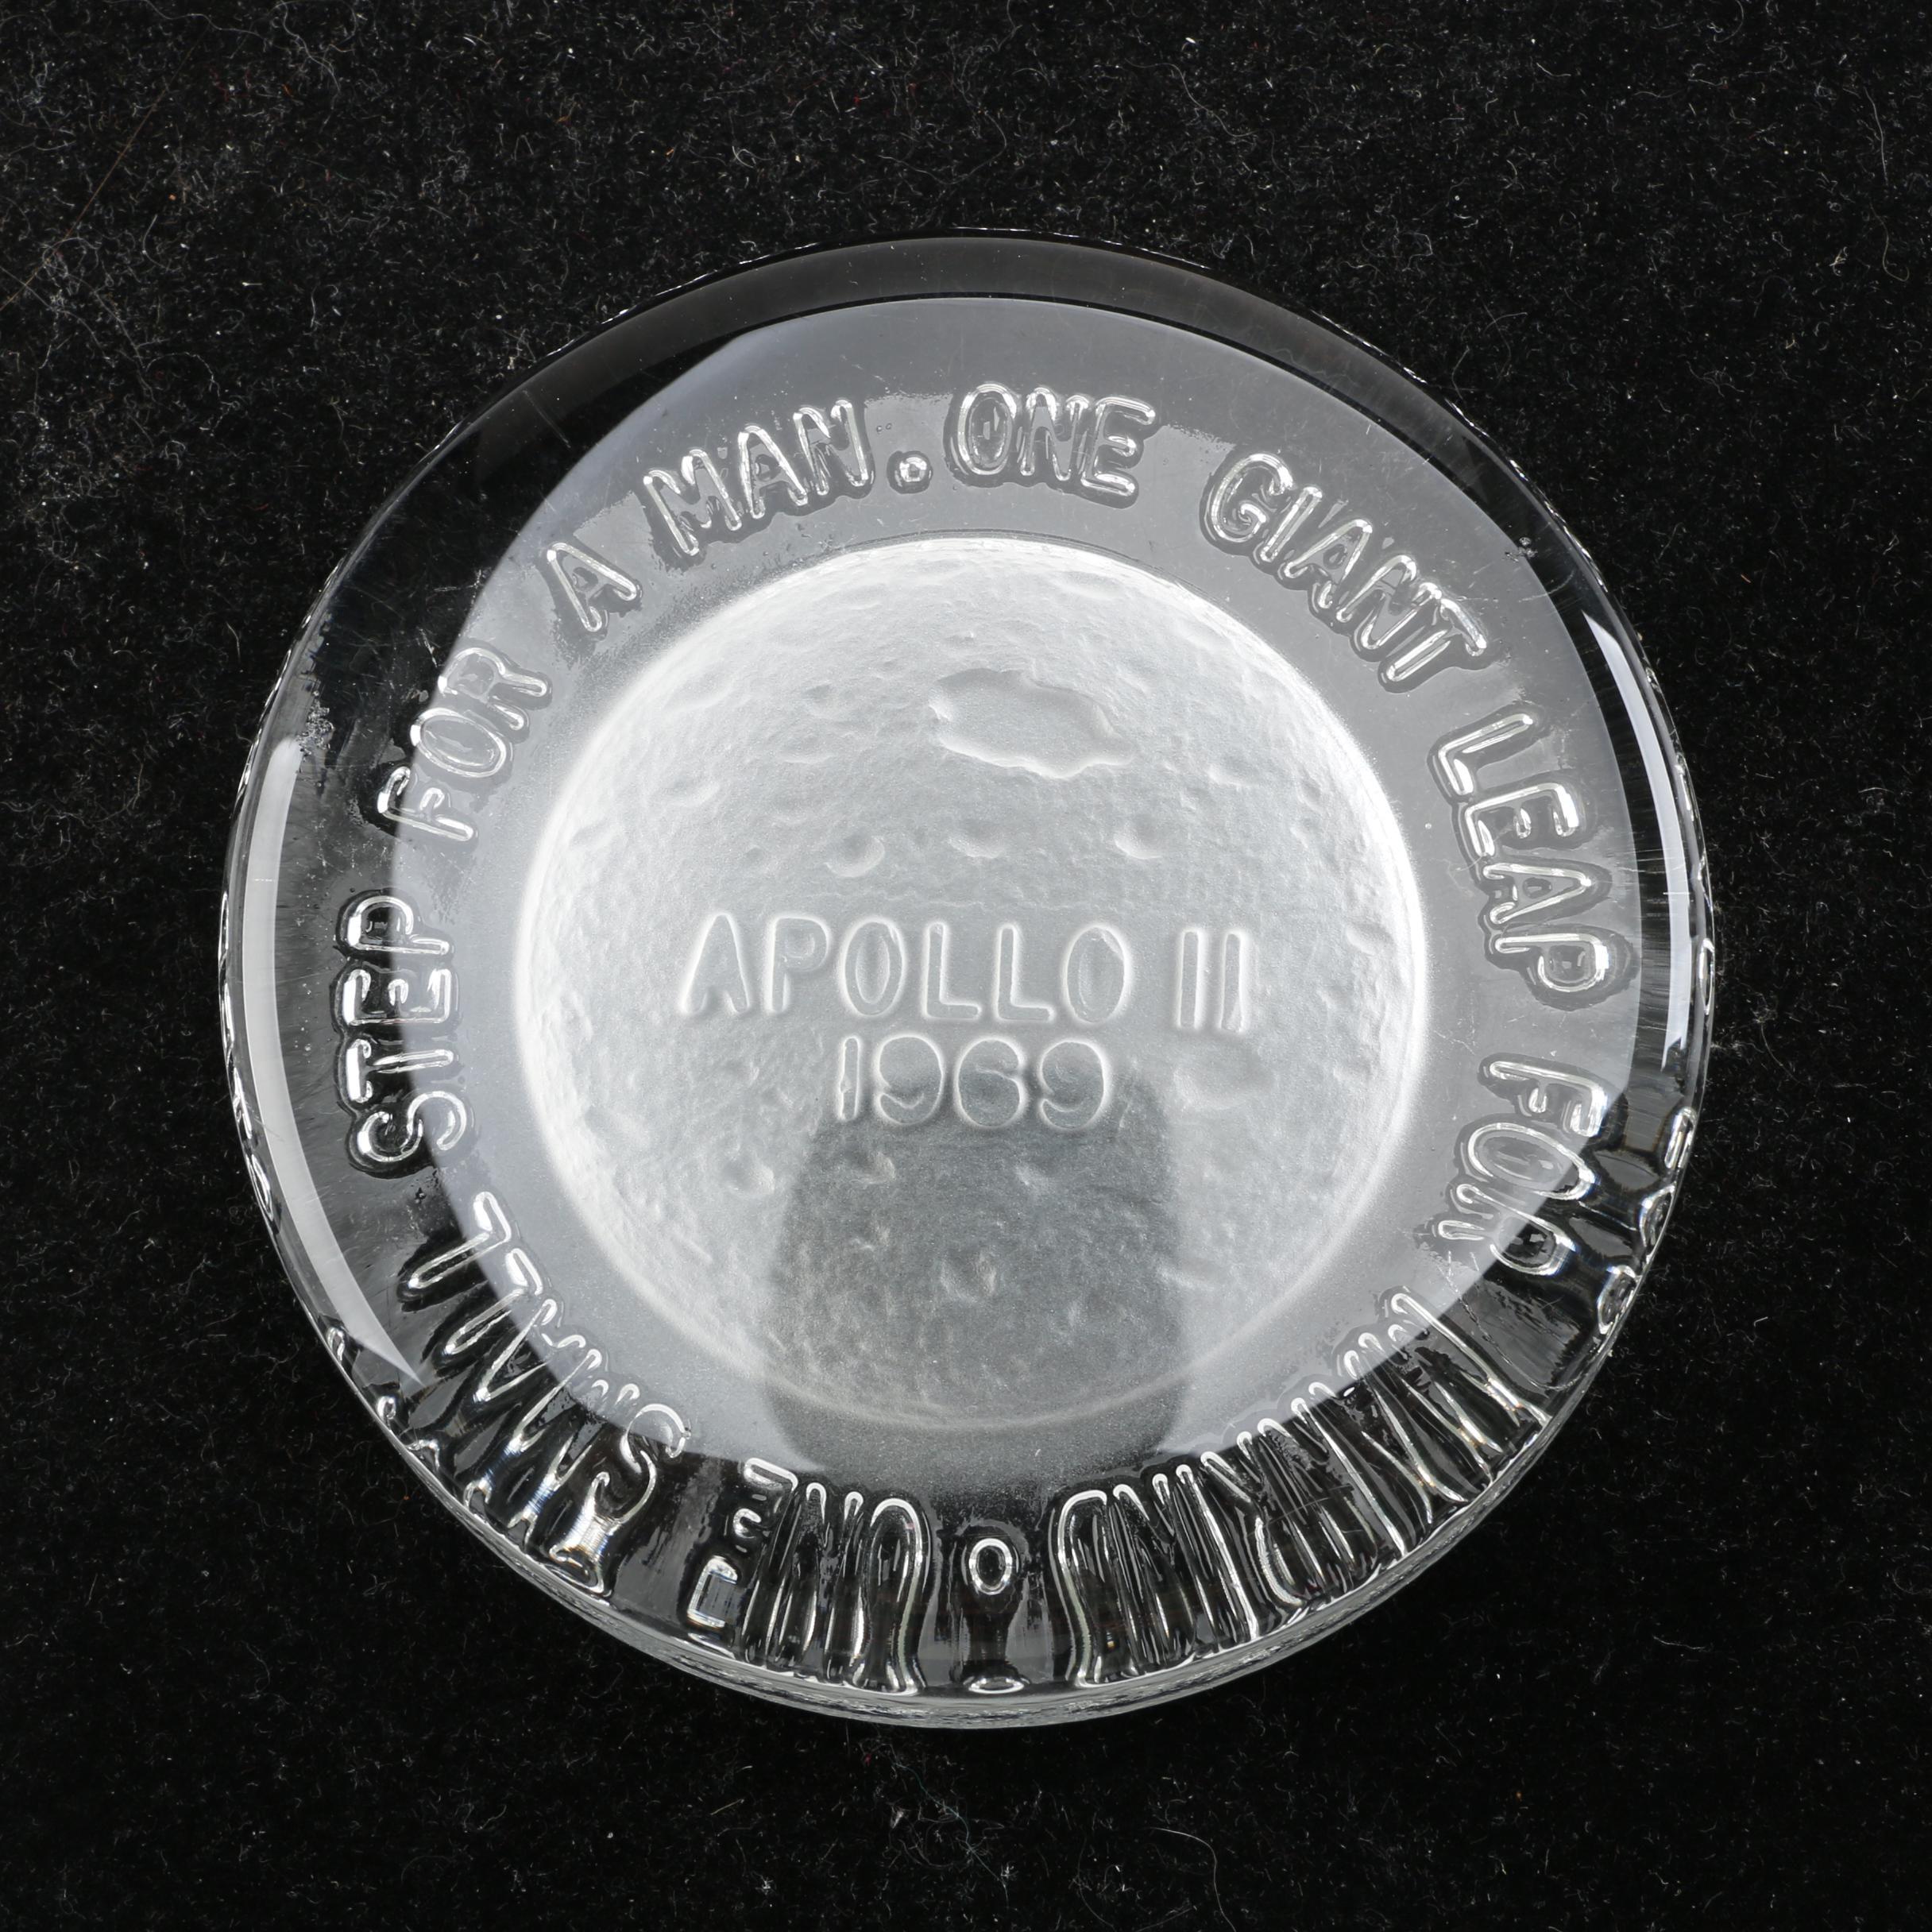 Mid-Century Modern Apollo II 1969 Moon Landing Commemorative Glass Paperweight